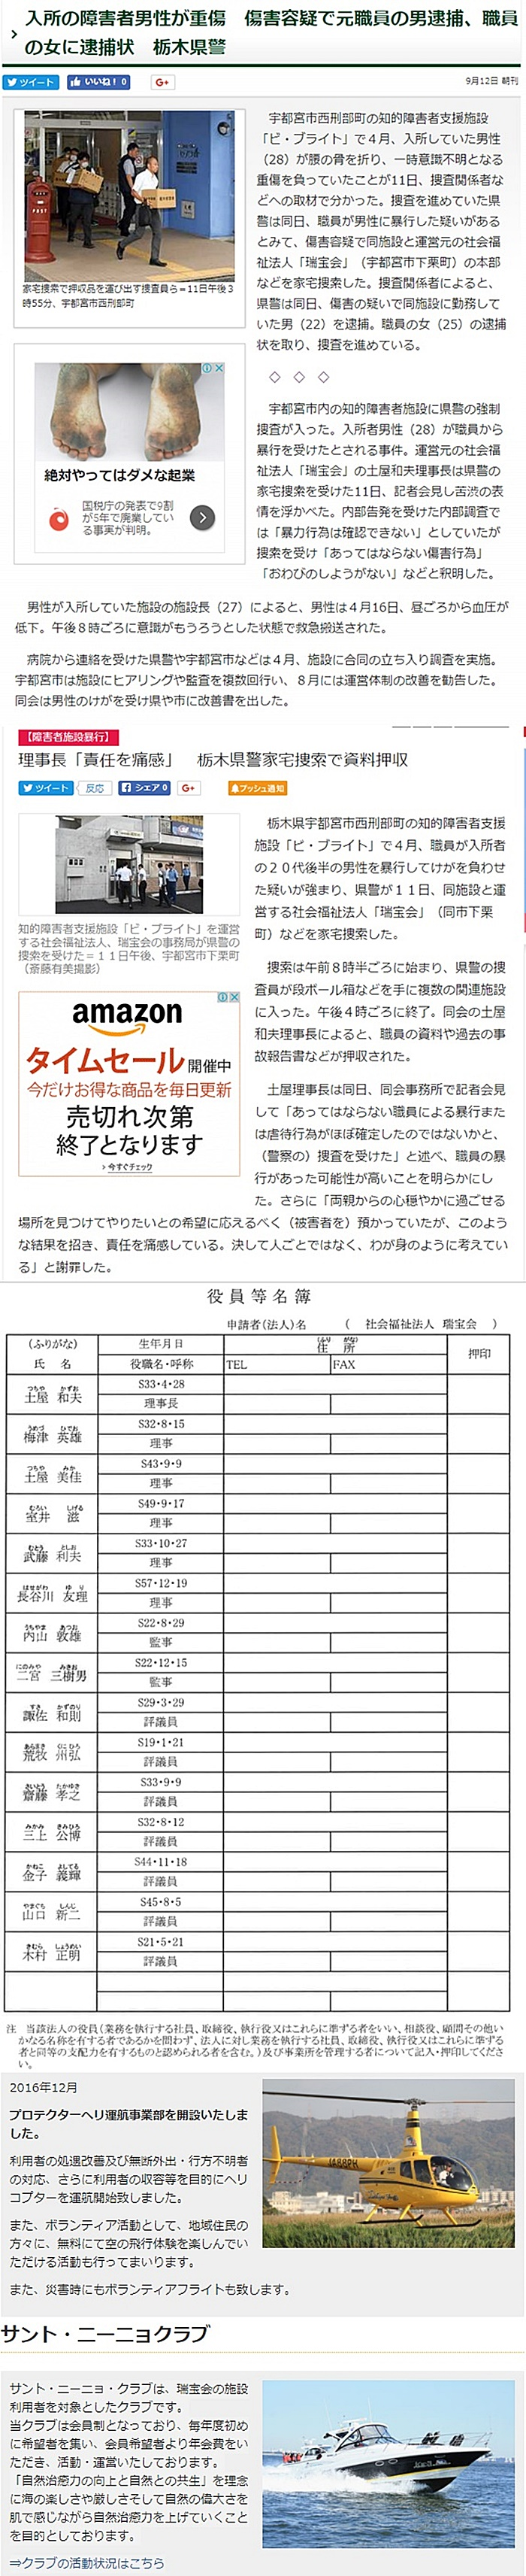 社会福祉法人瑞宝会 土屋和夫理事長 ビ・ブライト 6